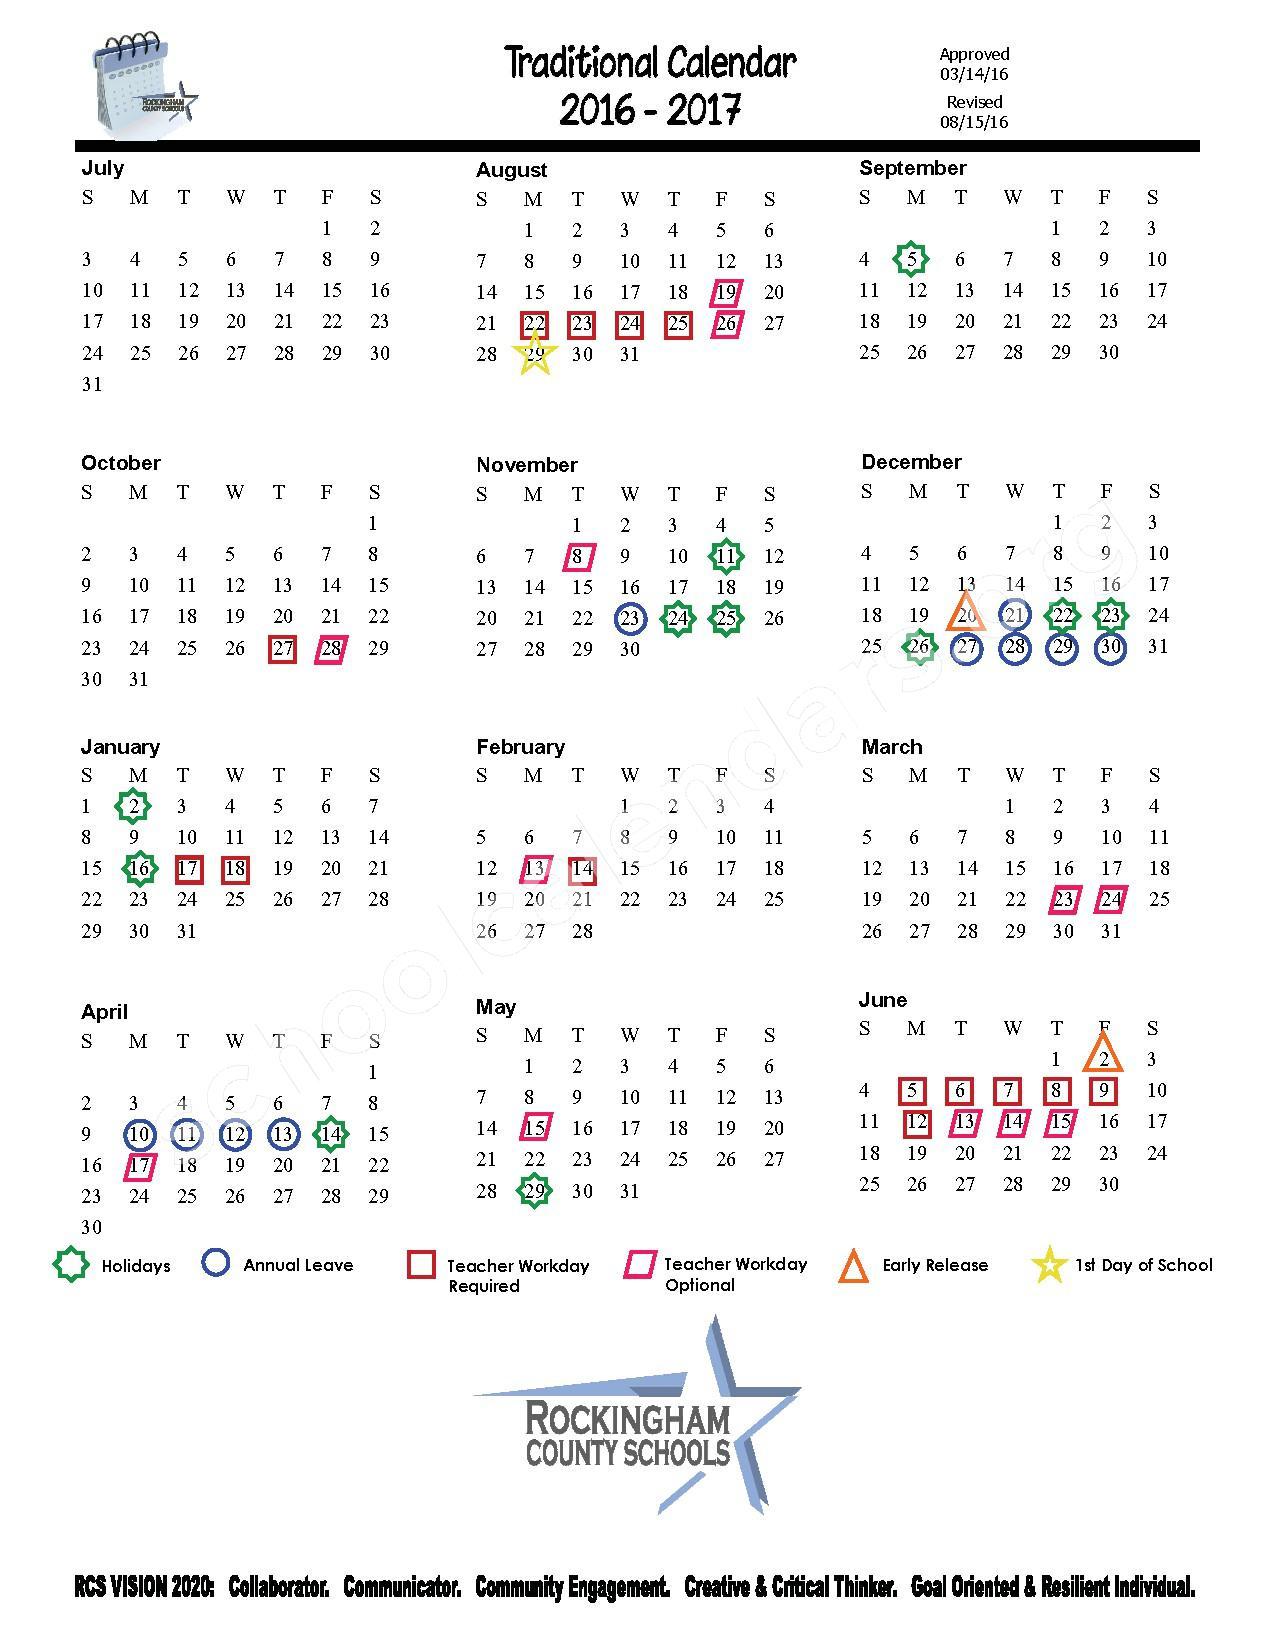 2016 - 2017 District Calendar – Rockingham County Schools – page 1